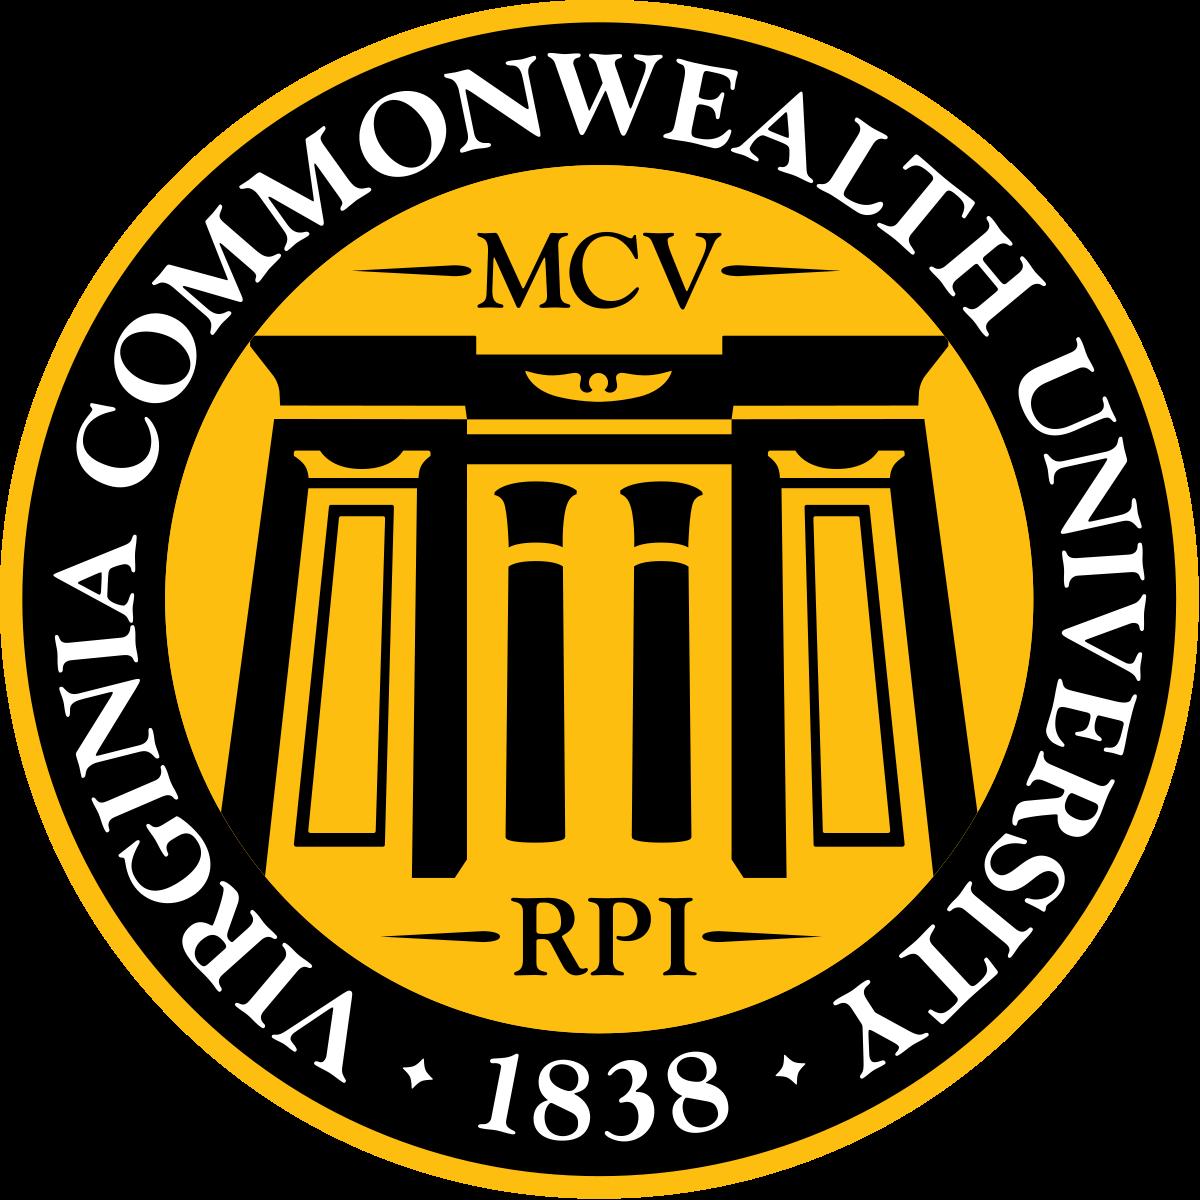 Virginia Commonwealth University - Top 30 Best Graphic Design Degree Programs 2020